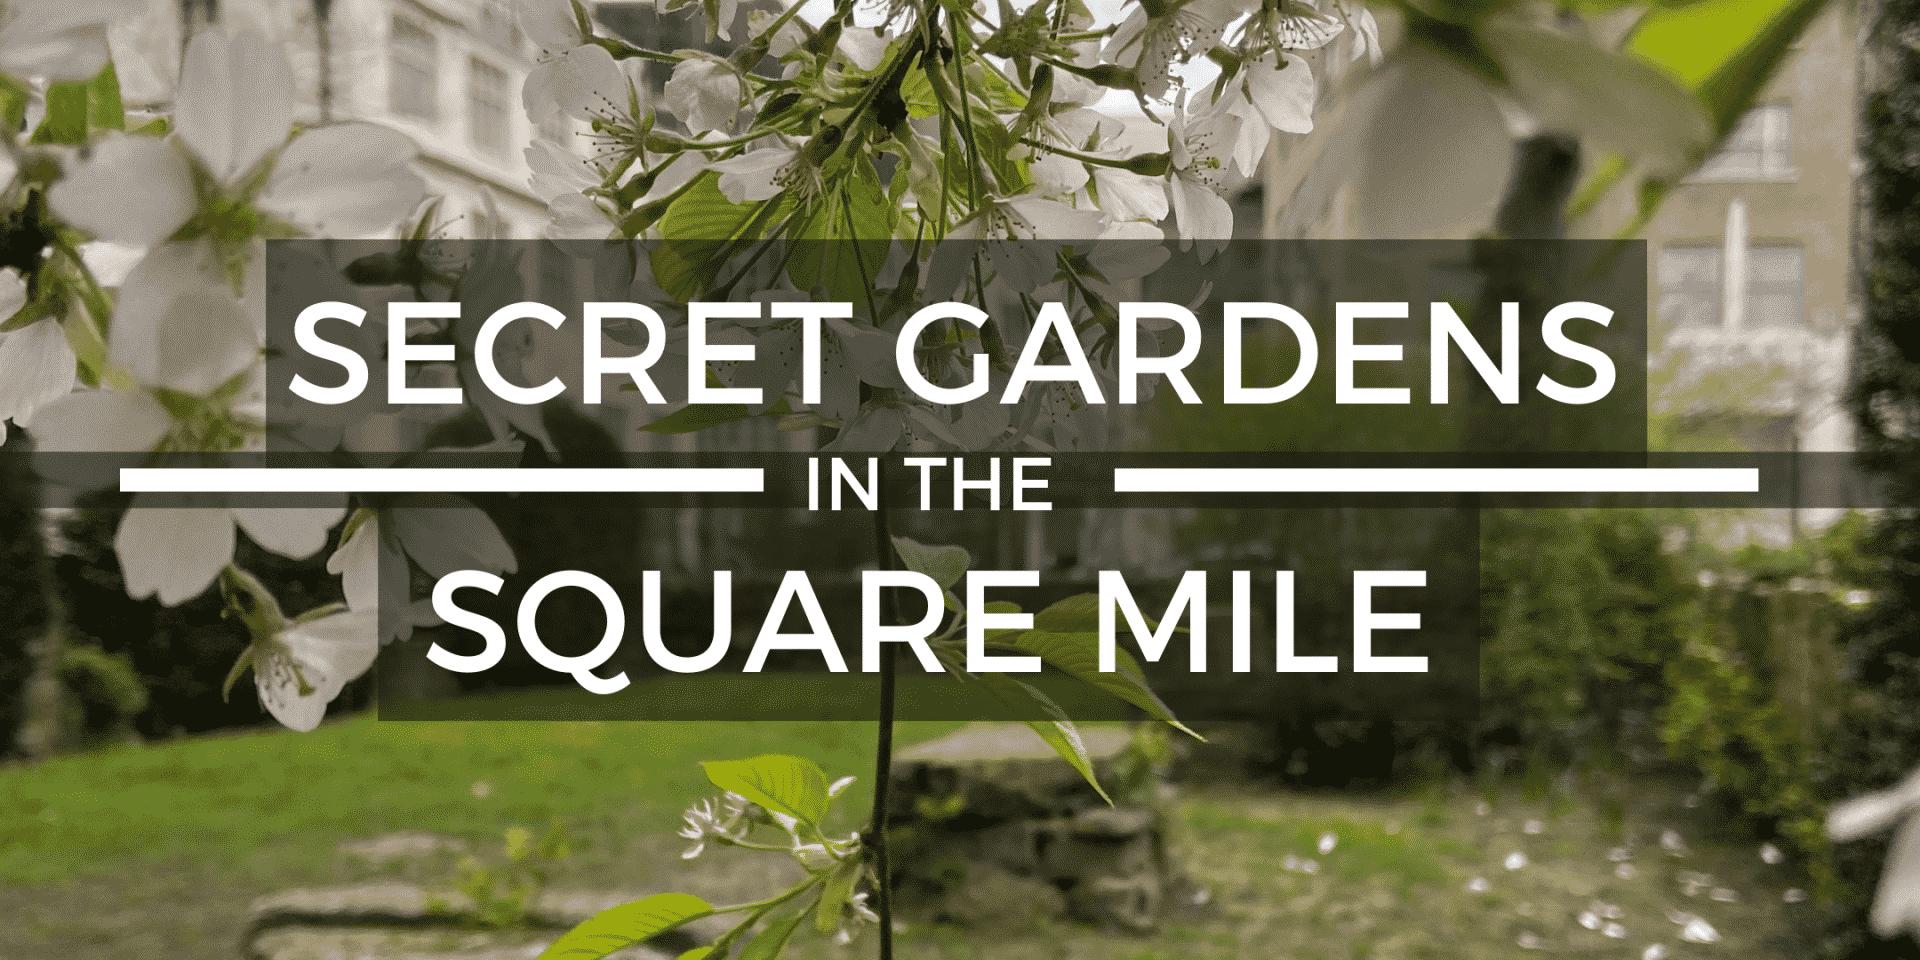 Secret Gardens in the City Virtual Tour